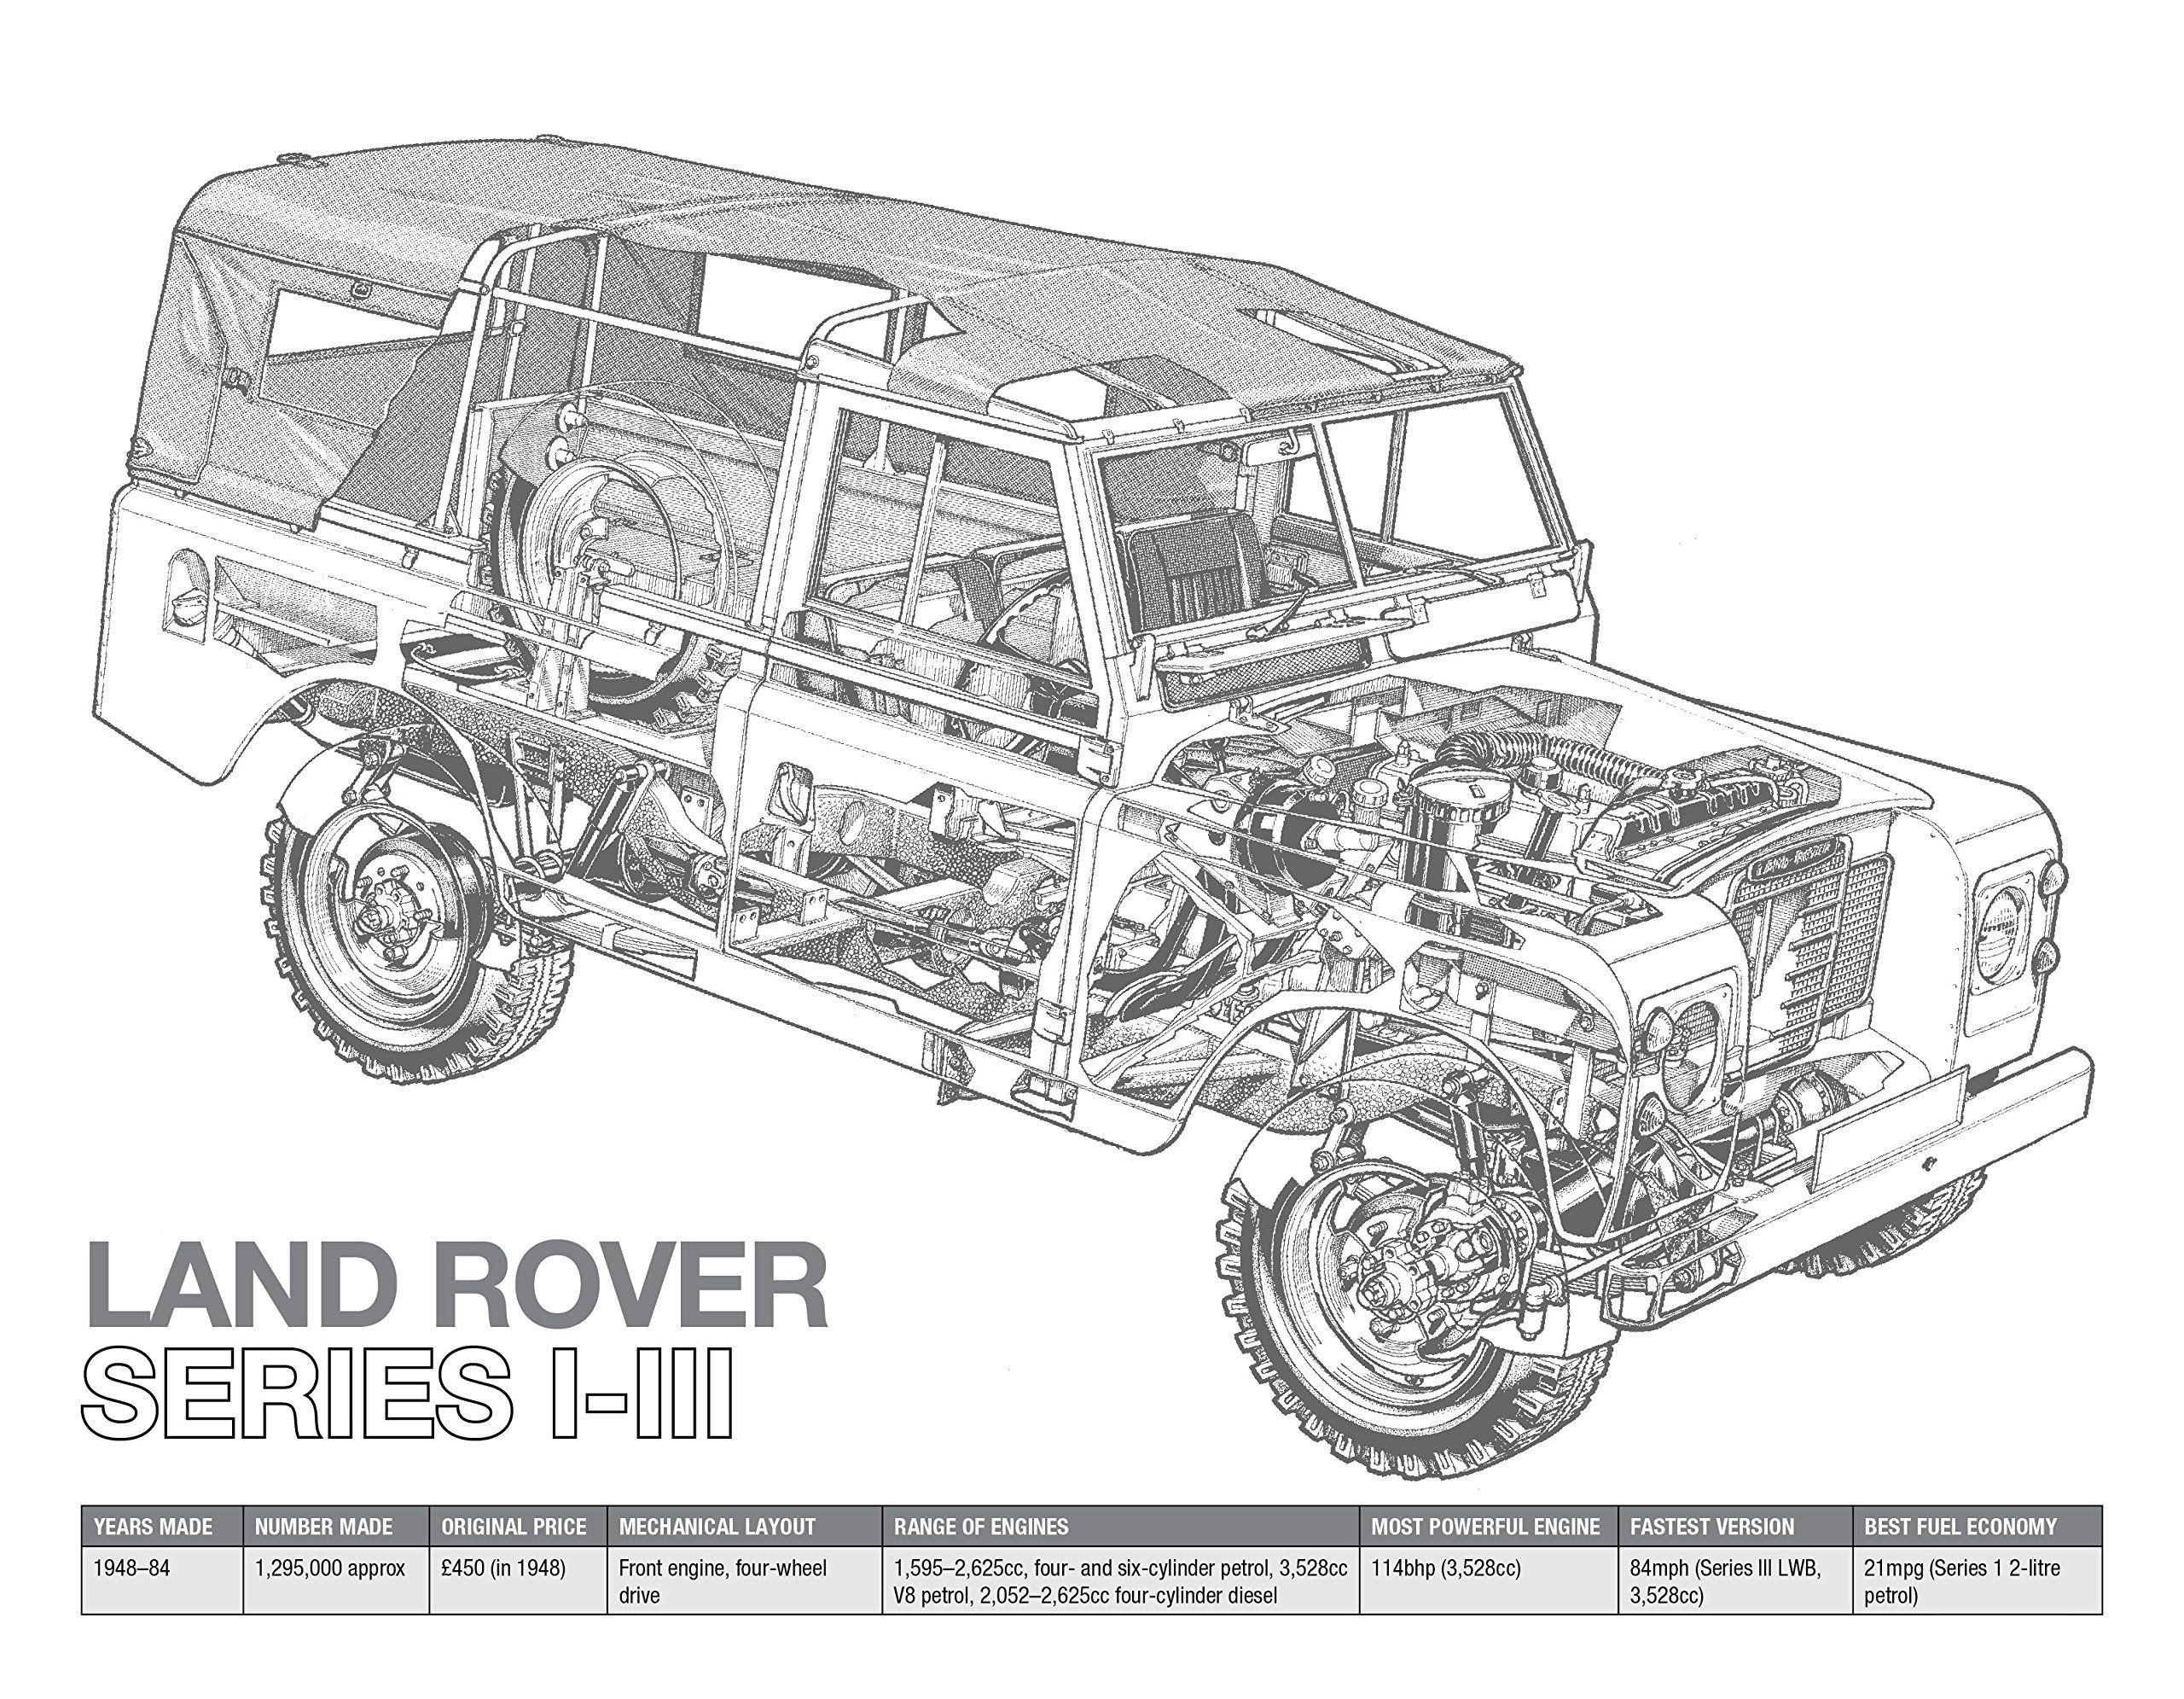 Utility Truck, Cutaway, Landrover Defender, Technical Illustrations,  Automotive Art, Landing,